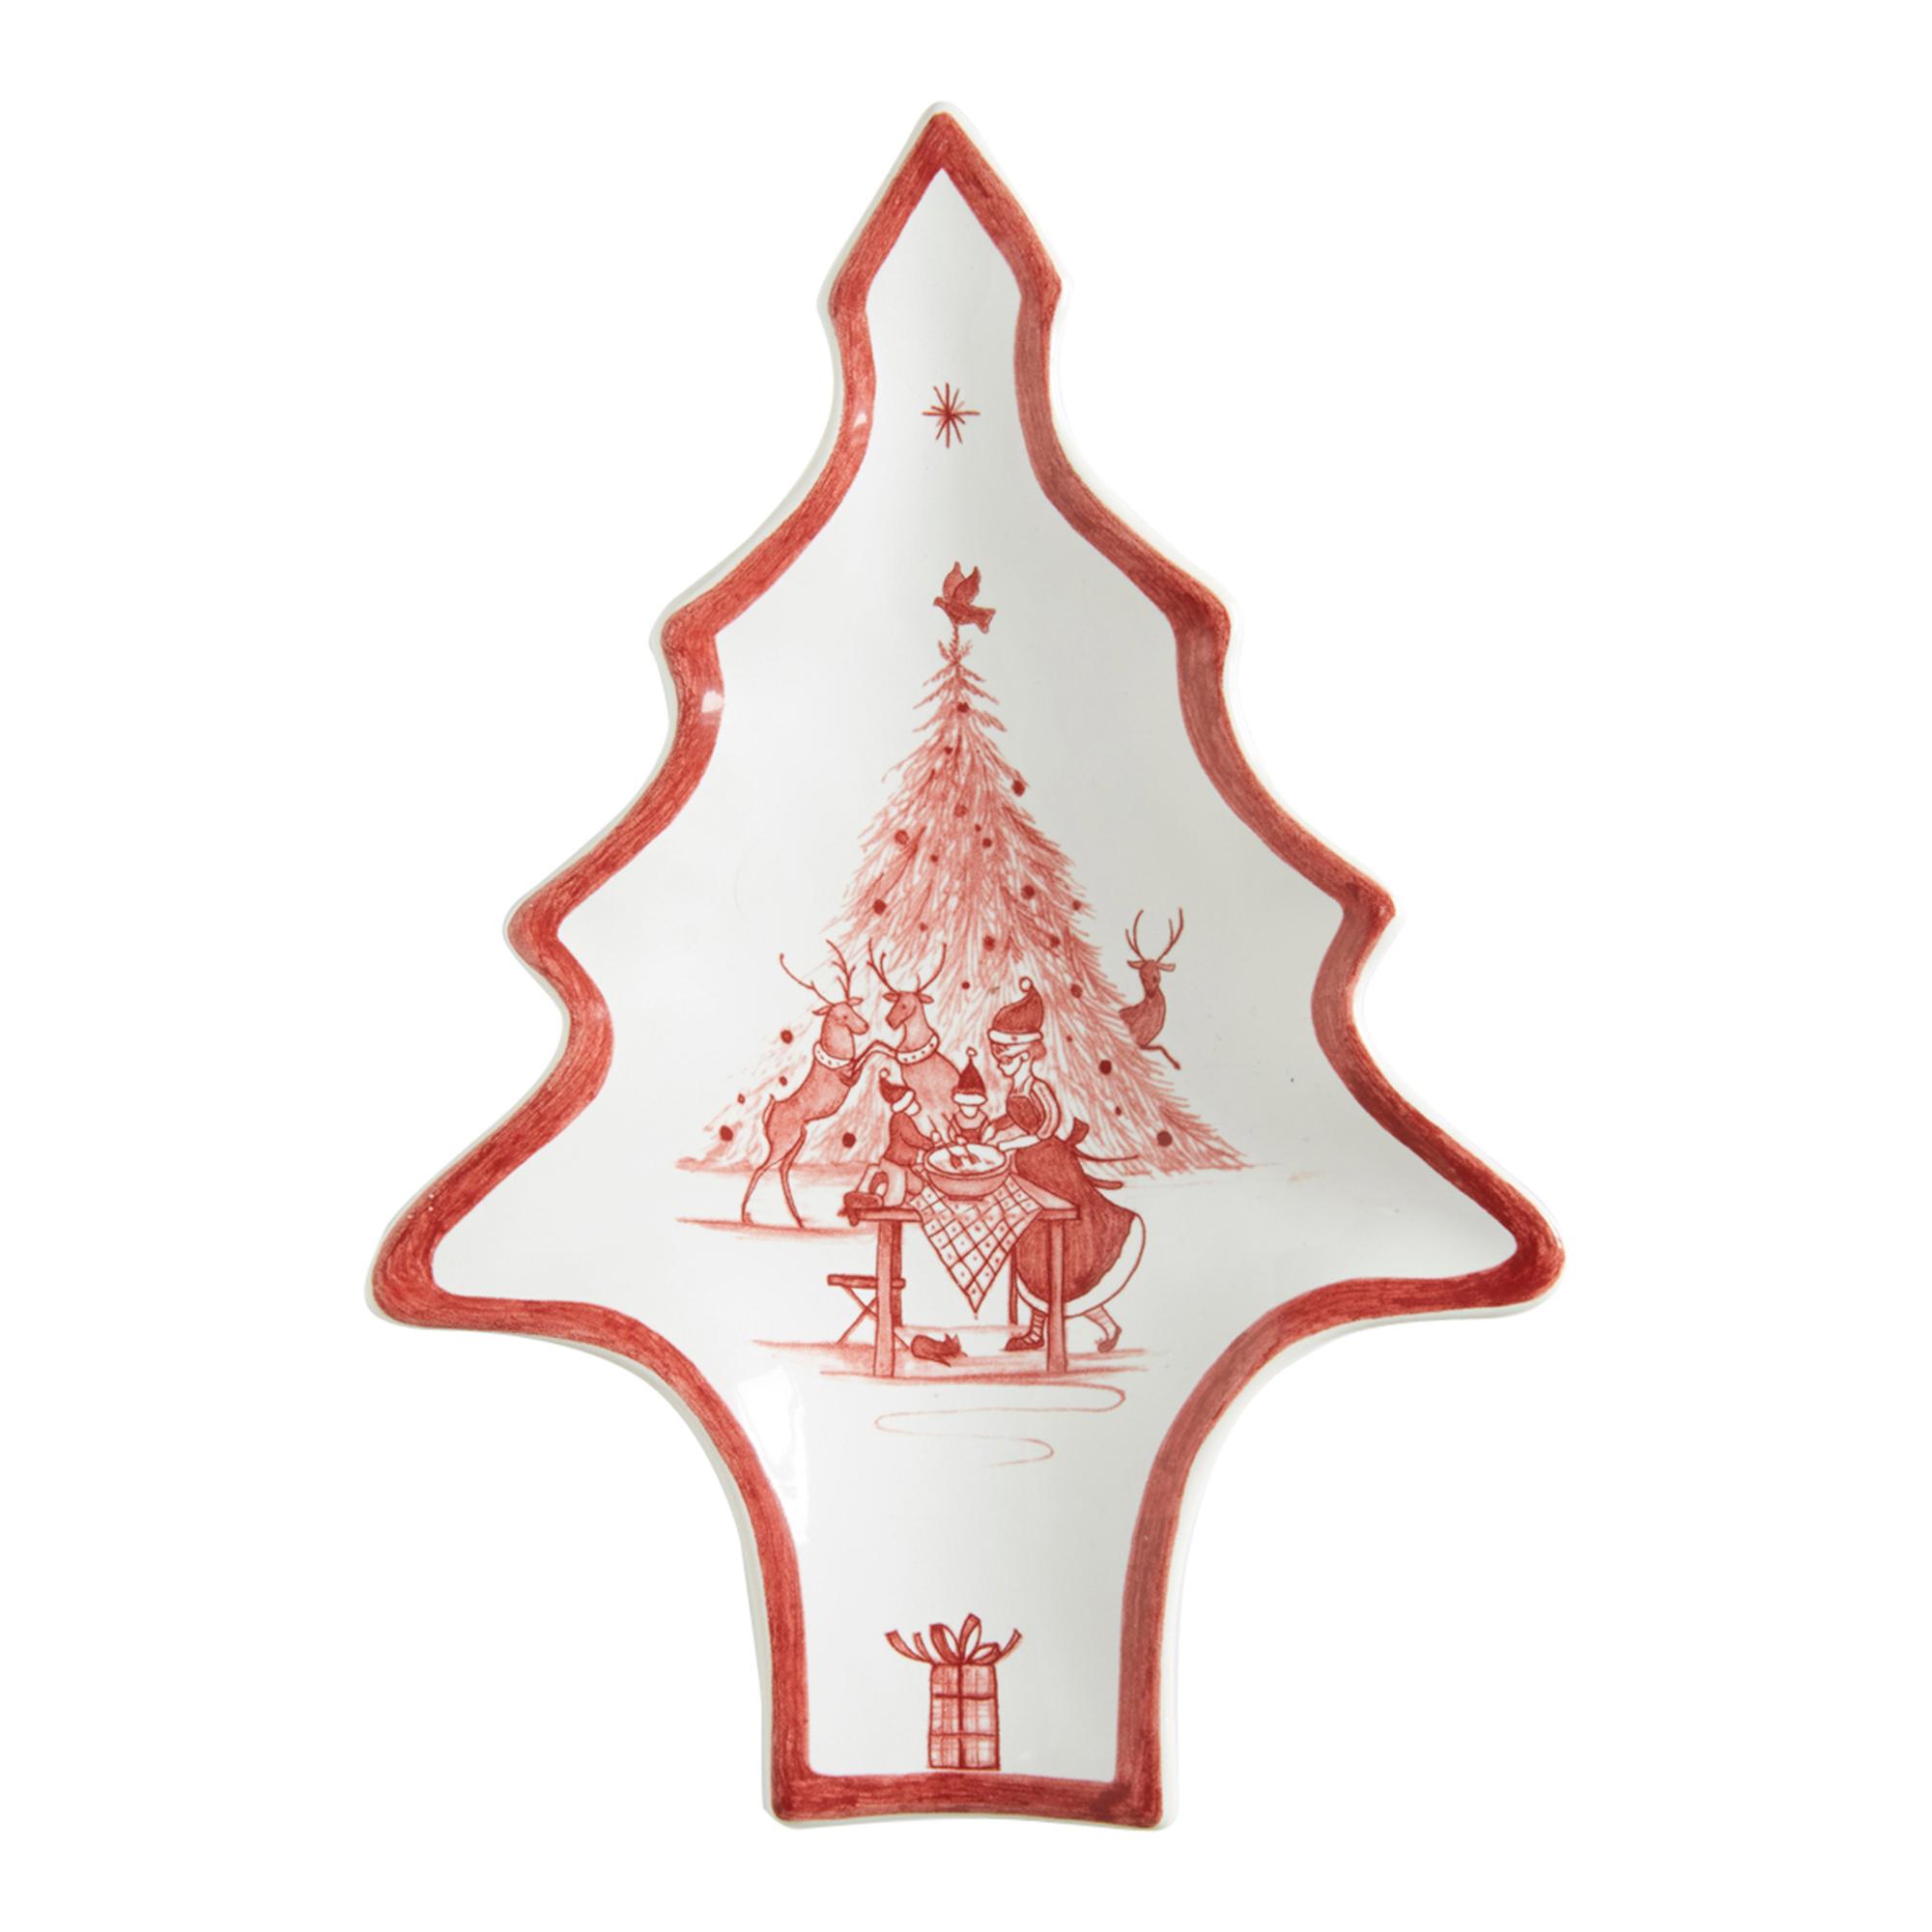 Juliska Reindeer Country Estate Spoon Rest | Gump\'s